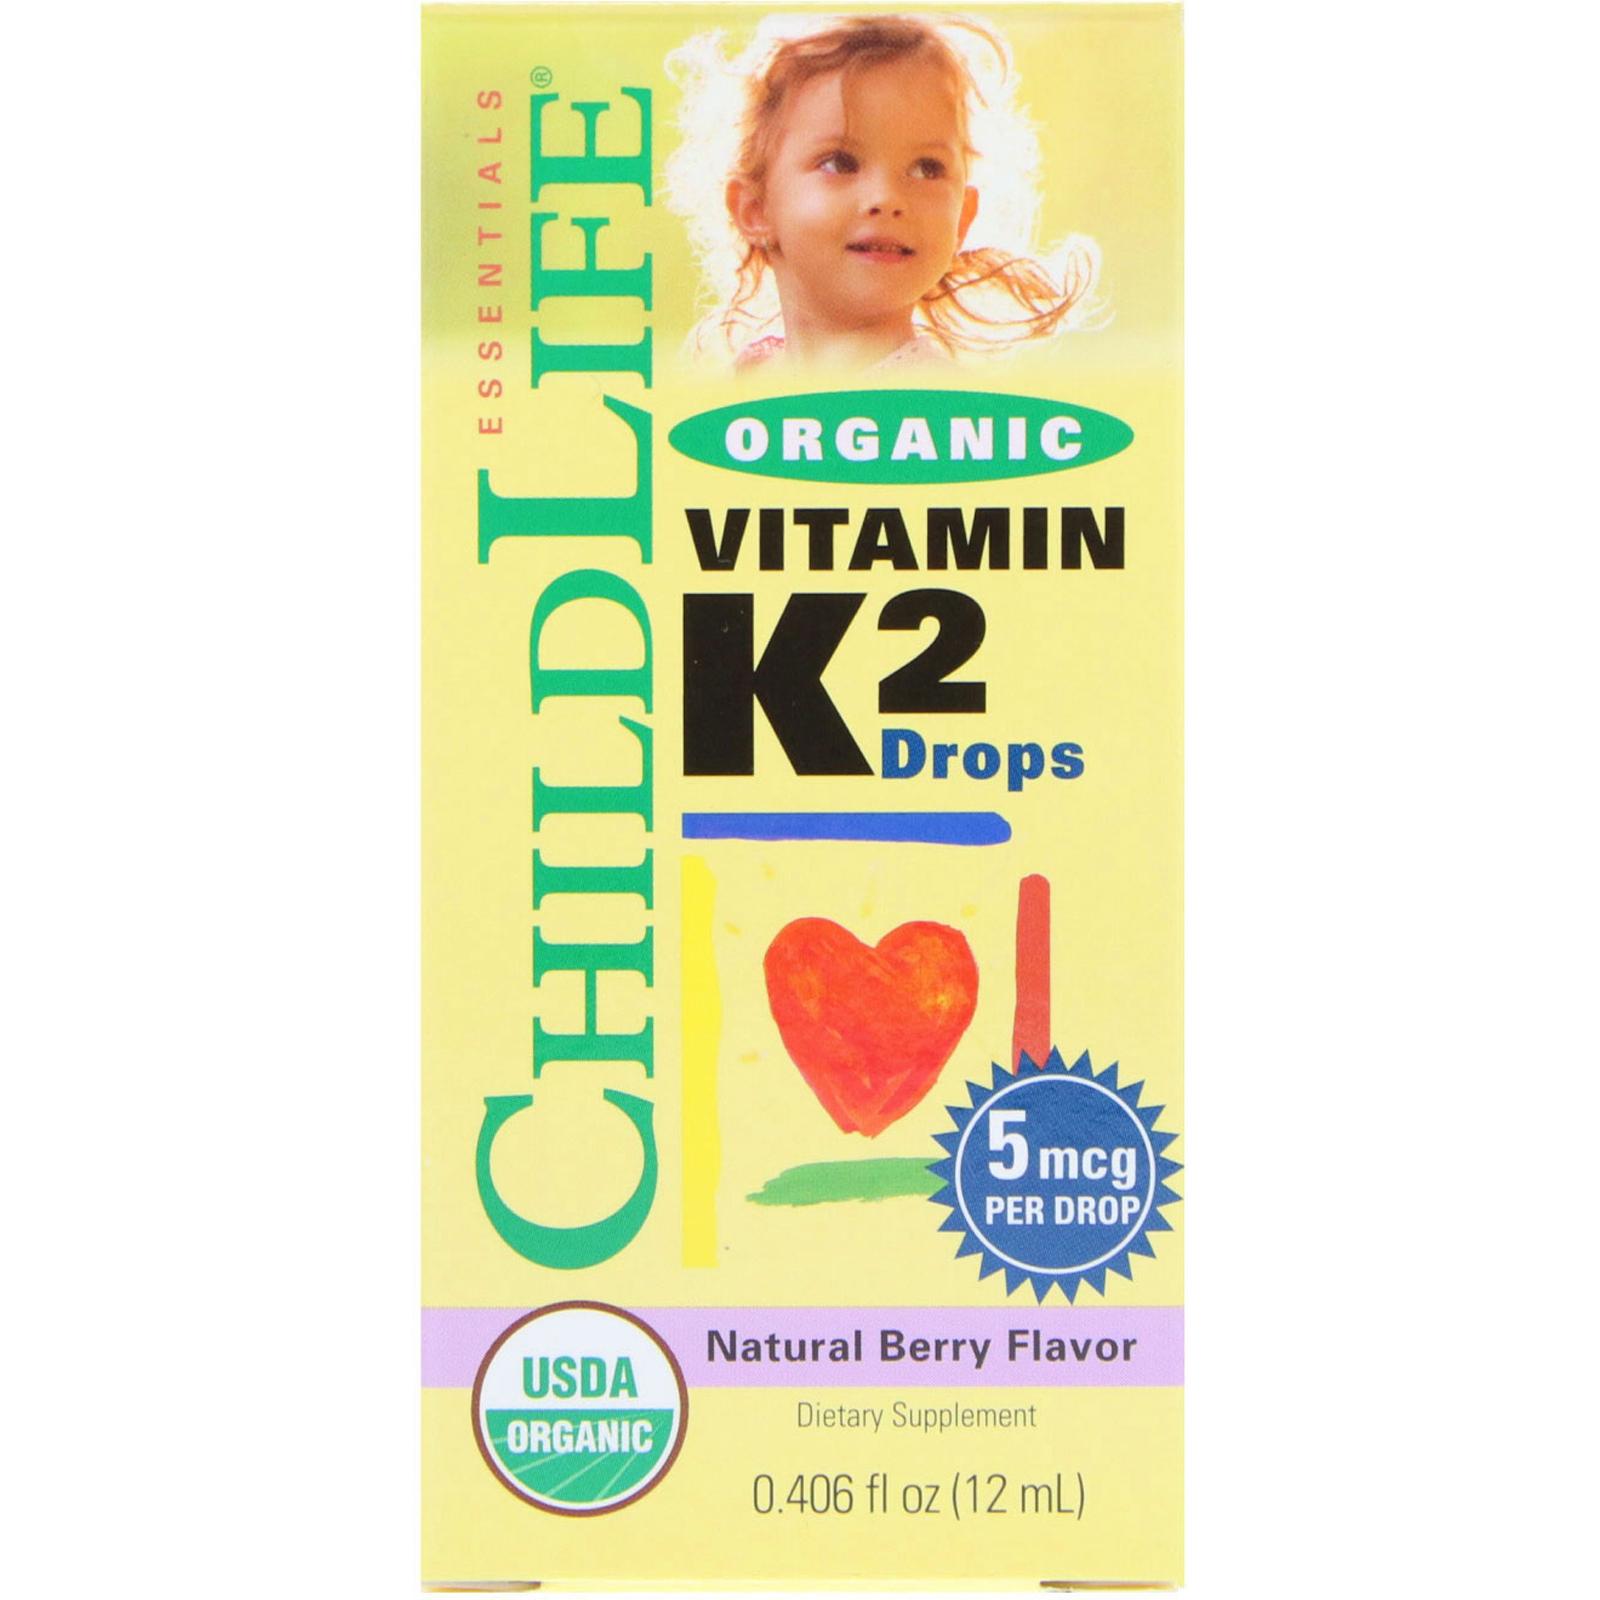 Childlife Organic Vitamin K2 Drops Natural Berry Flavor 0406 Fl